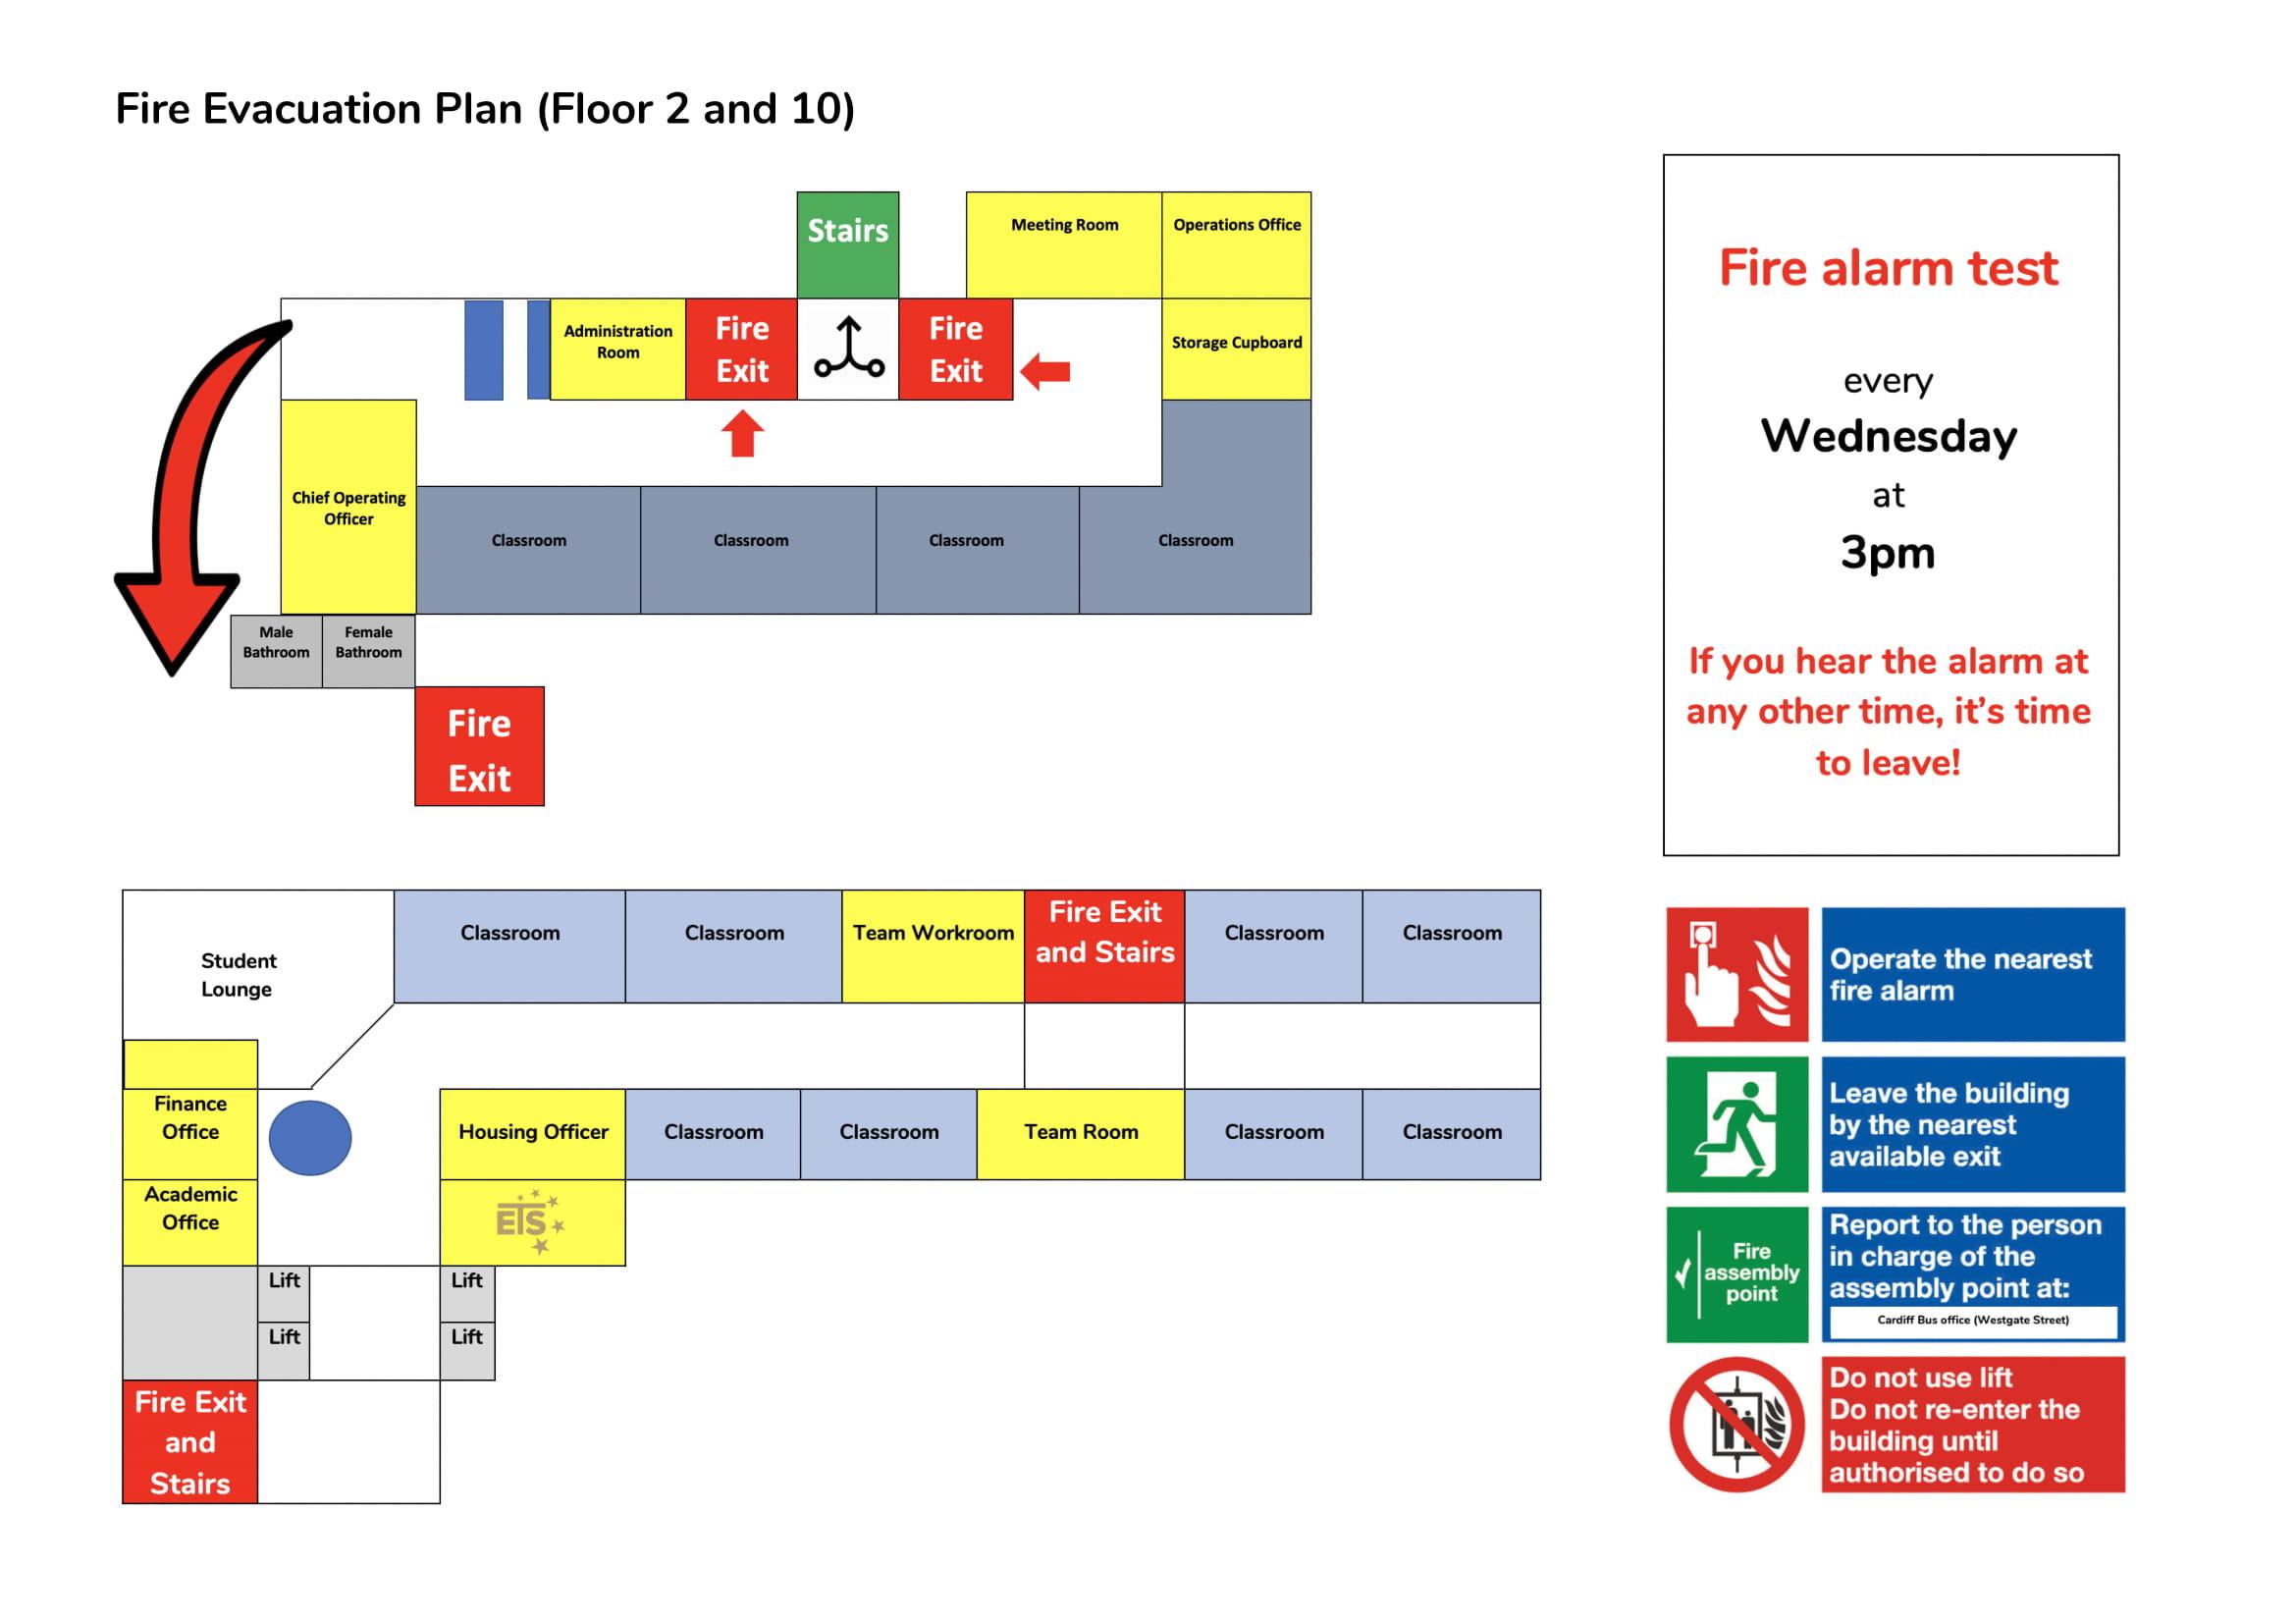 Fire Evacuation Plan 1 - Registration